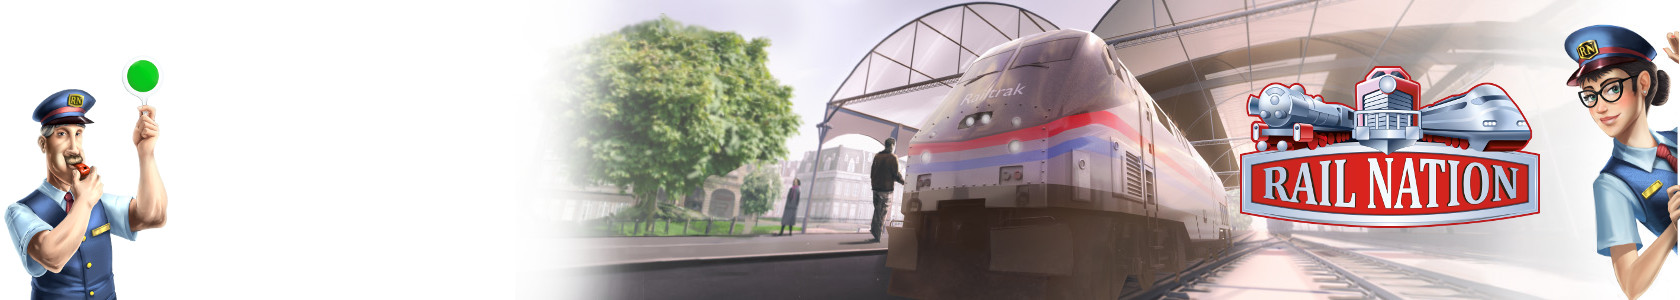 Rail Nation - Bahn fahren leicht gemacht